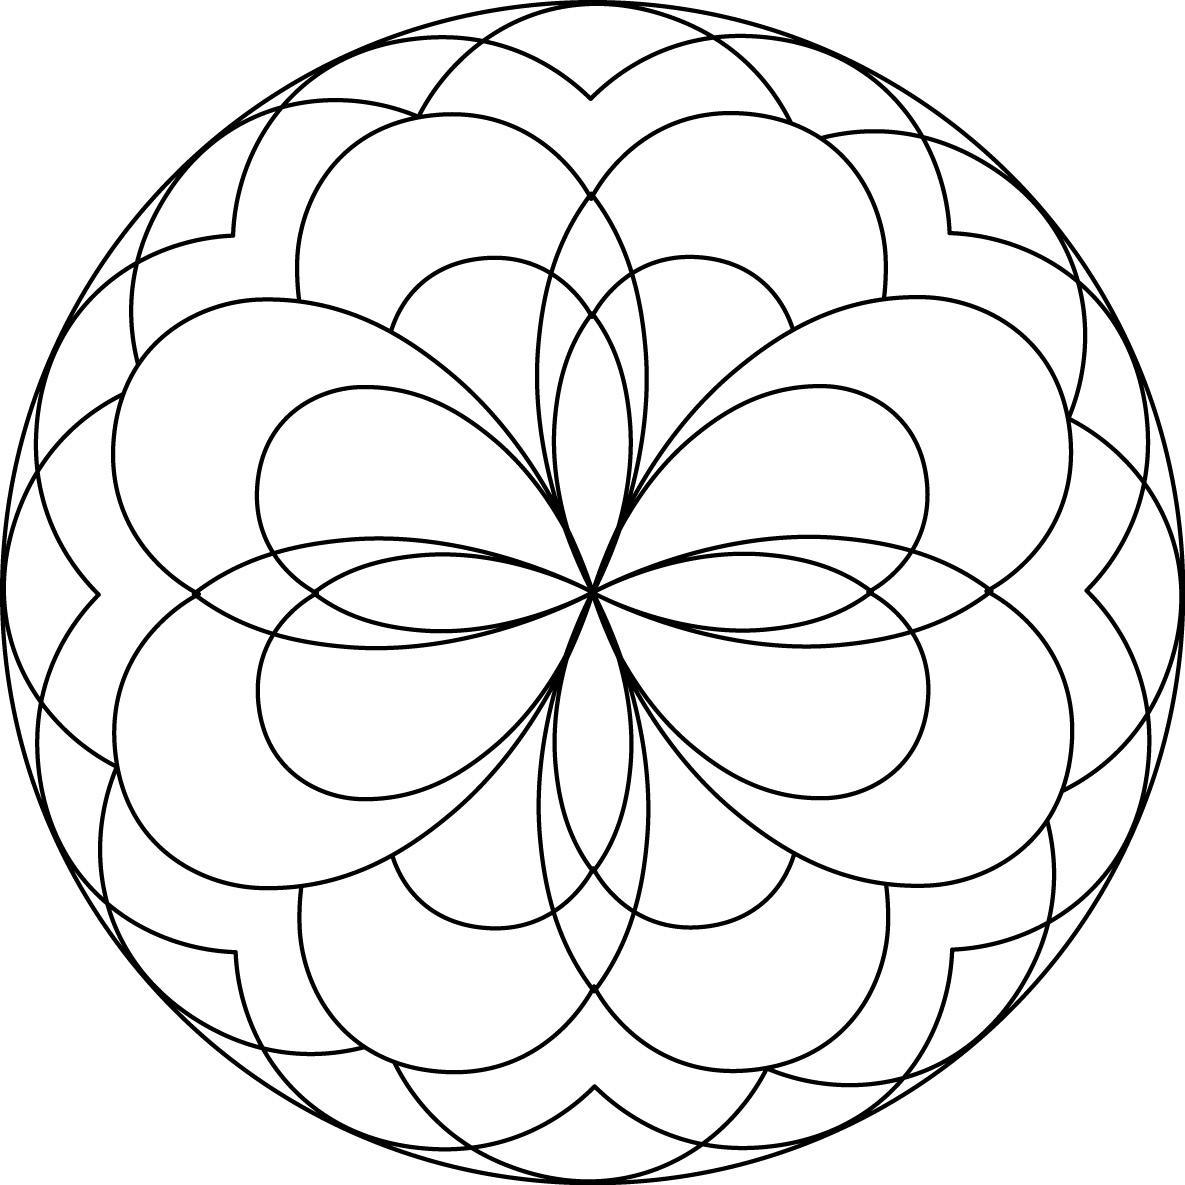 1185x1185 Easy Mandala Coloring Page